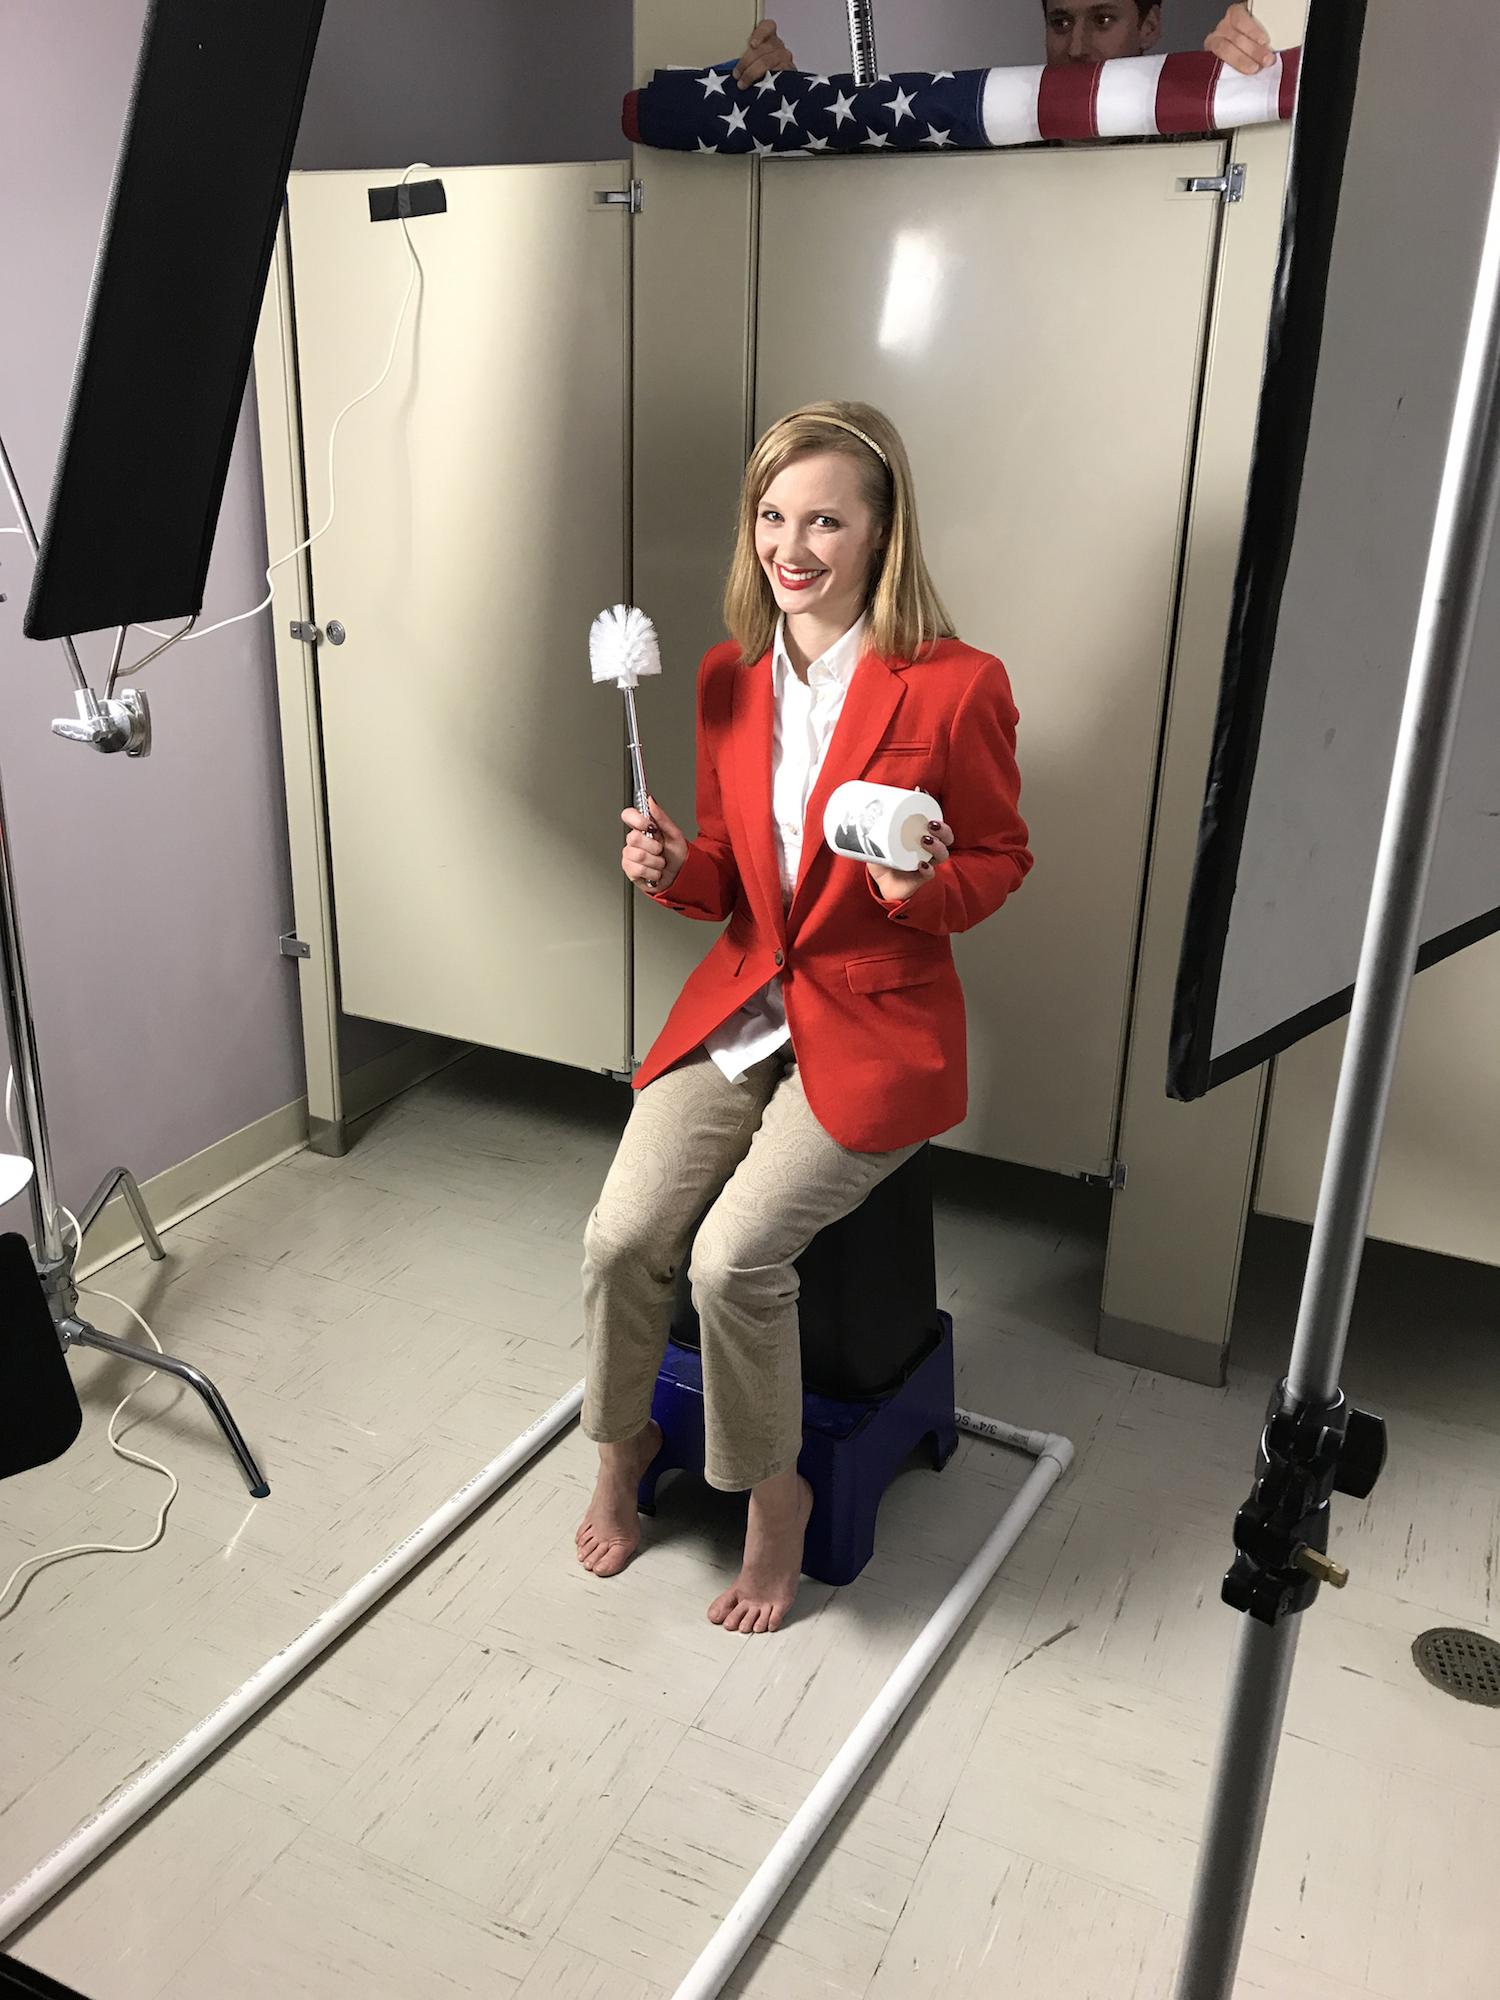 Helena Morris (and Andrew Frechette, peeking out) behind the scenes on Geena Matuson's (@geenamatuson) video 'Dump Trump,' part of her #Fauxmercials series in 2017. See more @ thegirlmirage.com.